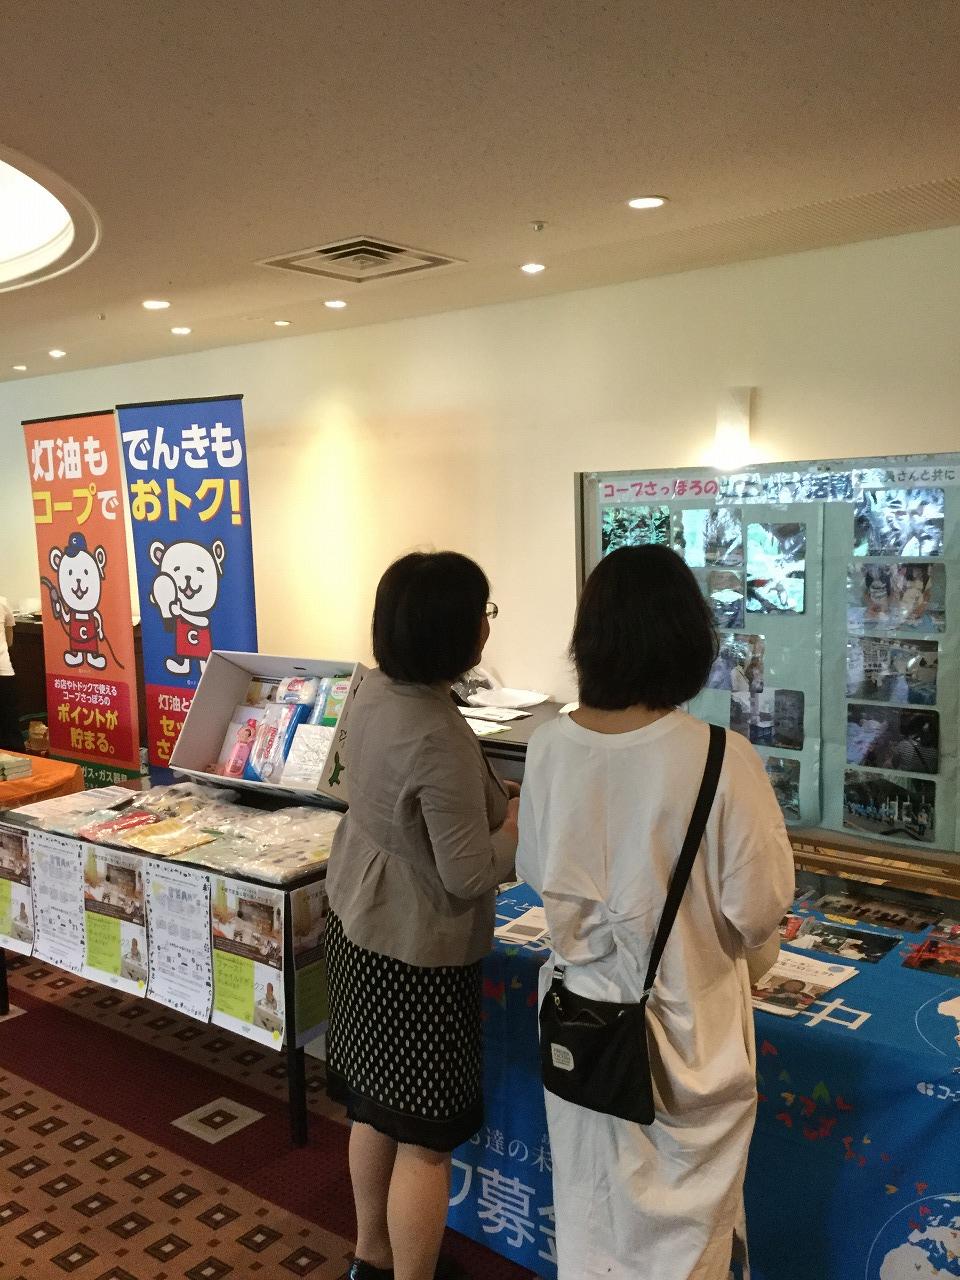 http://www.unicef-hokkaido.jp/img/6%E3%80%817%E6%97%AD%E5%B7%9D%20%281%29.jpg